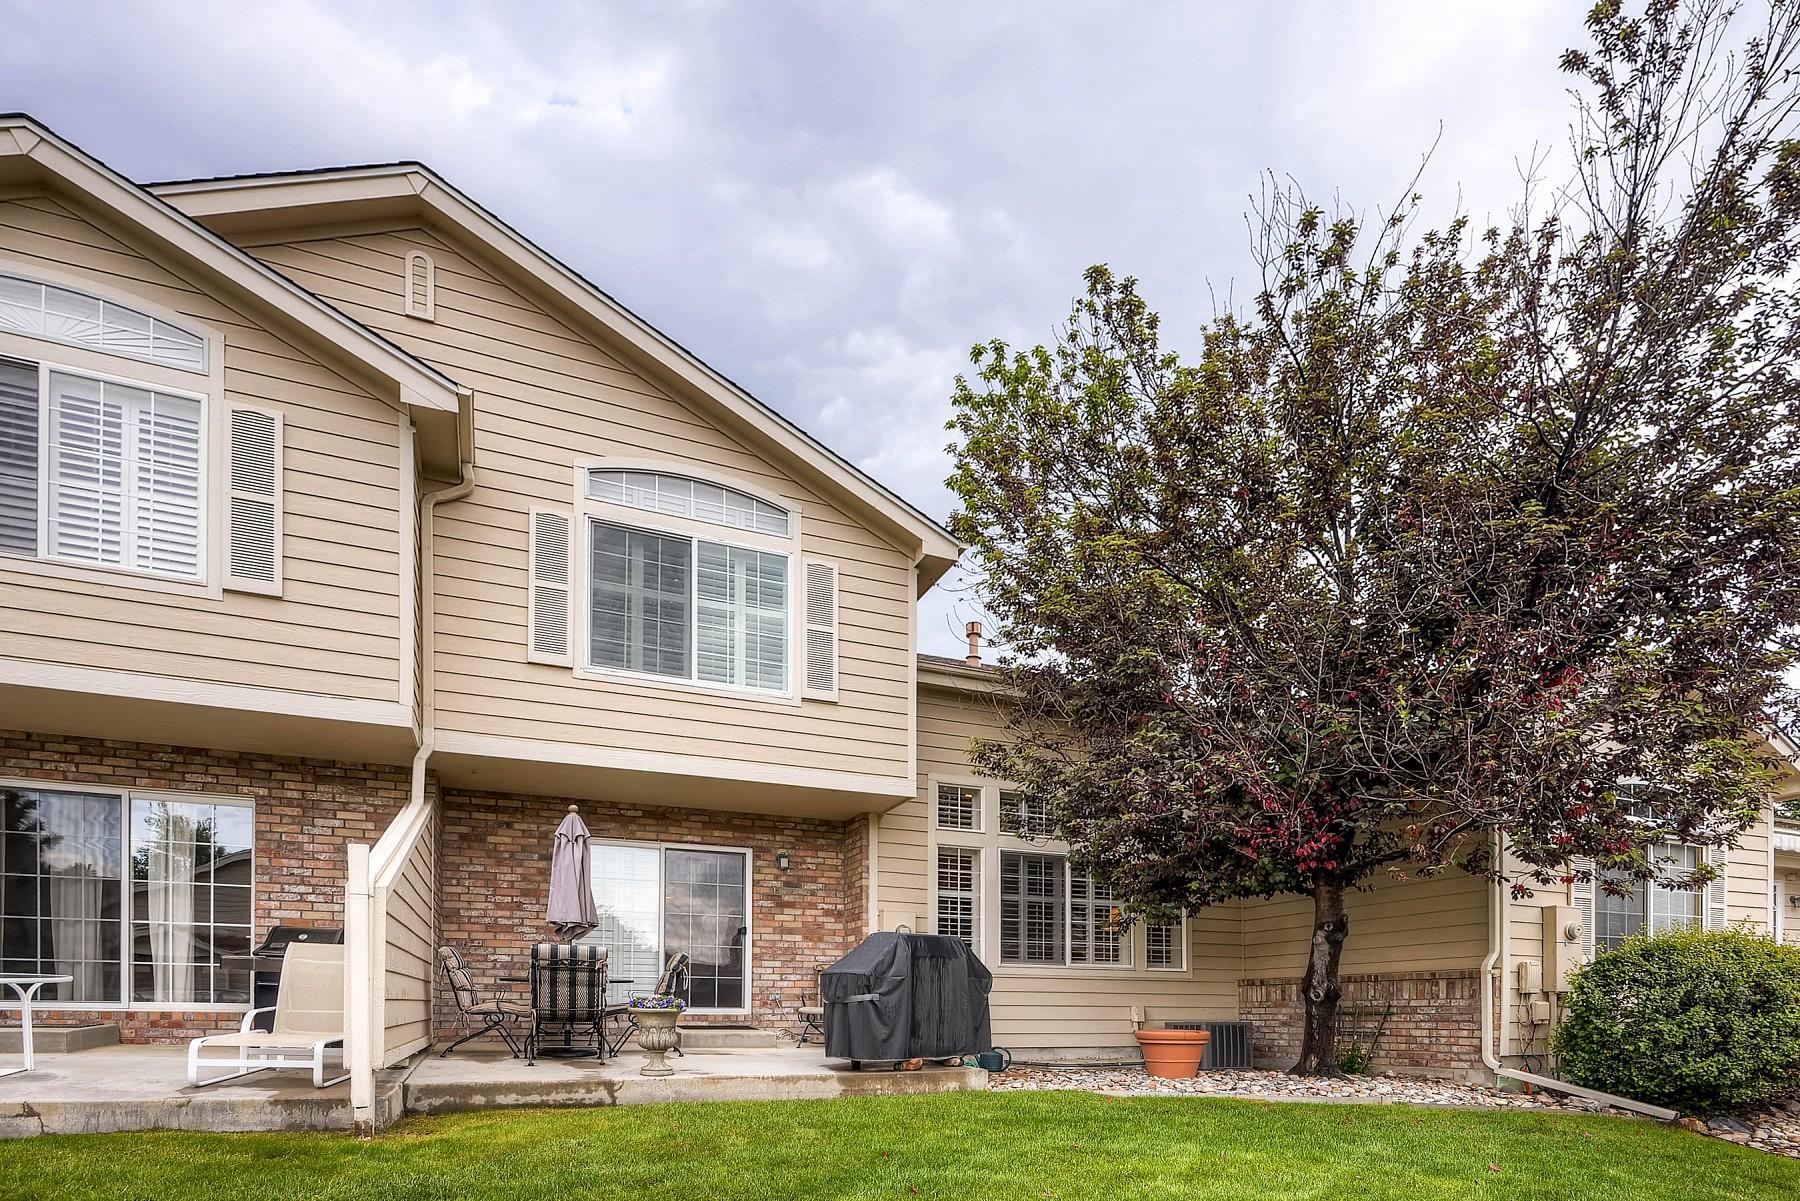 7700 West Grant Ranch Boulevard #8B, Littleton, CO 80123